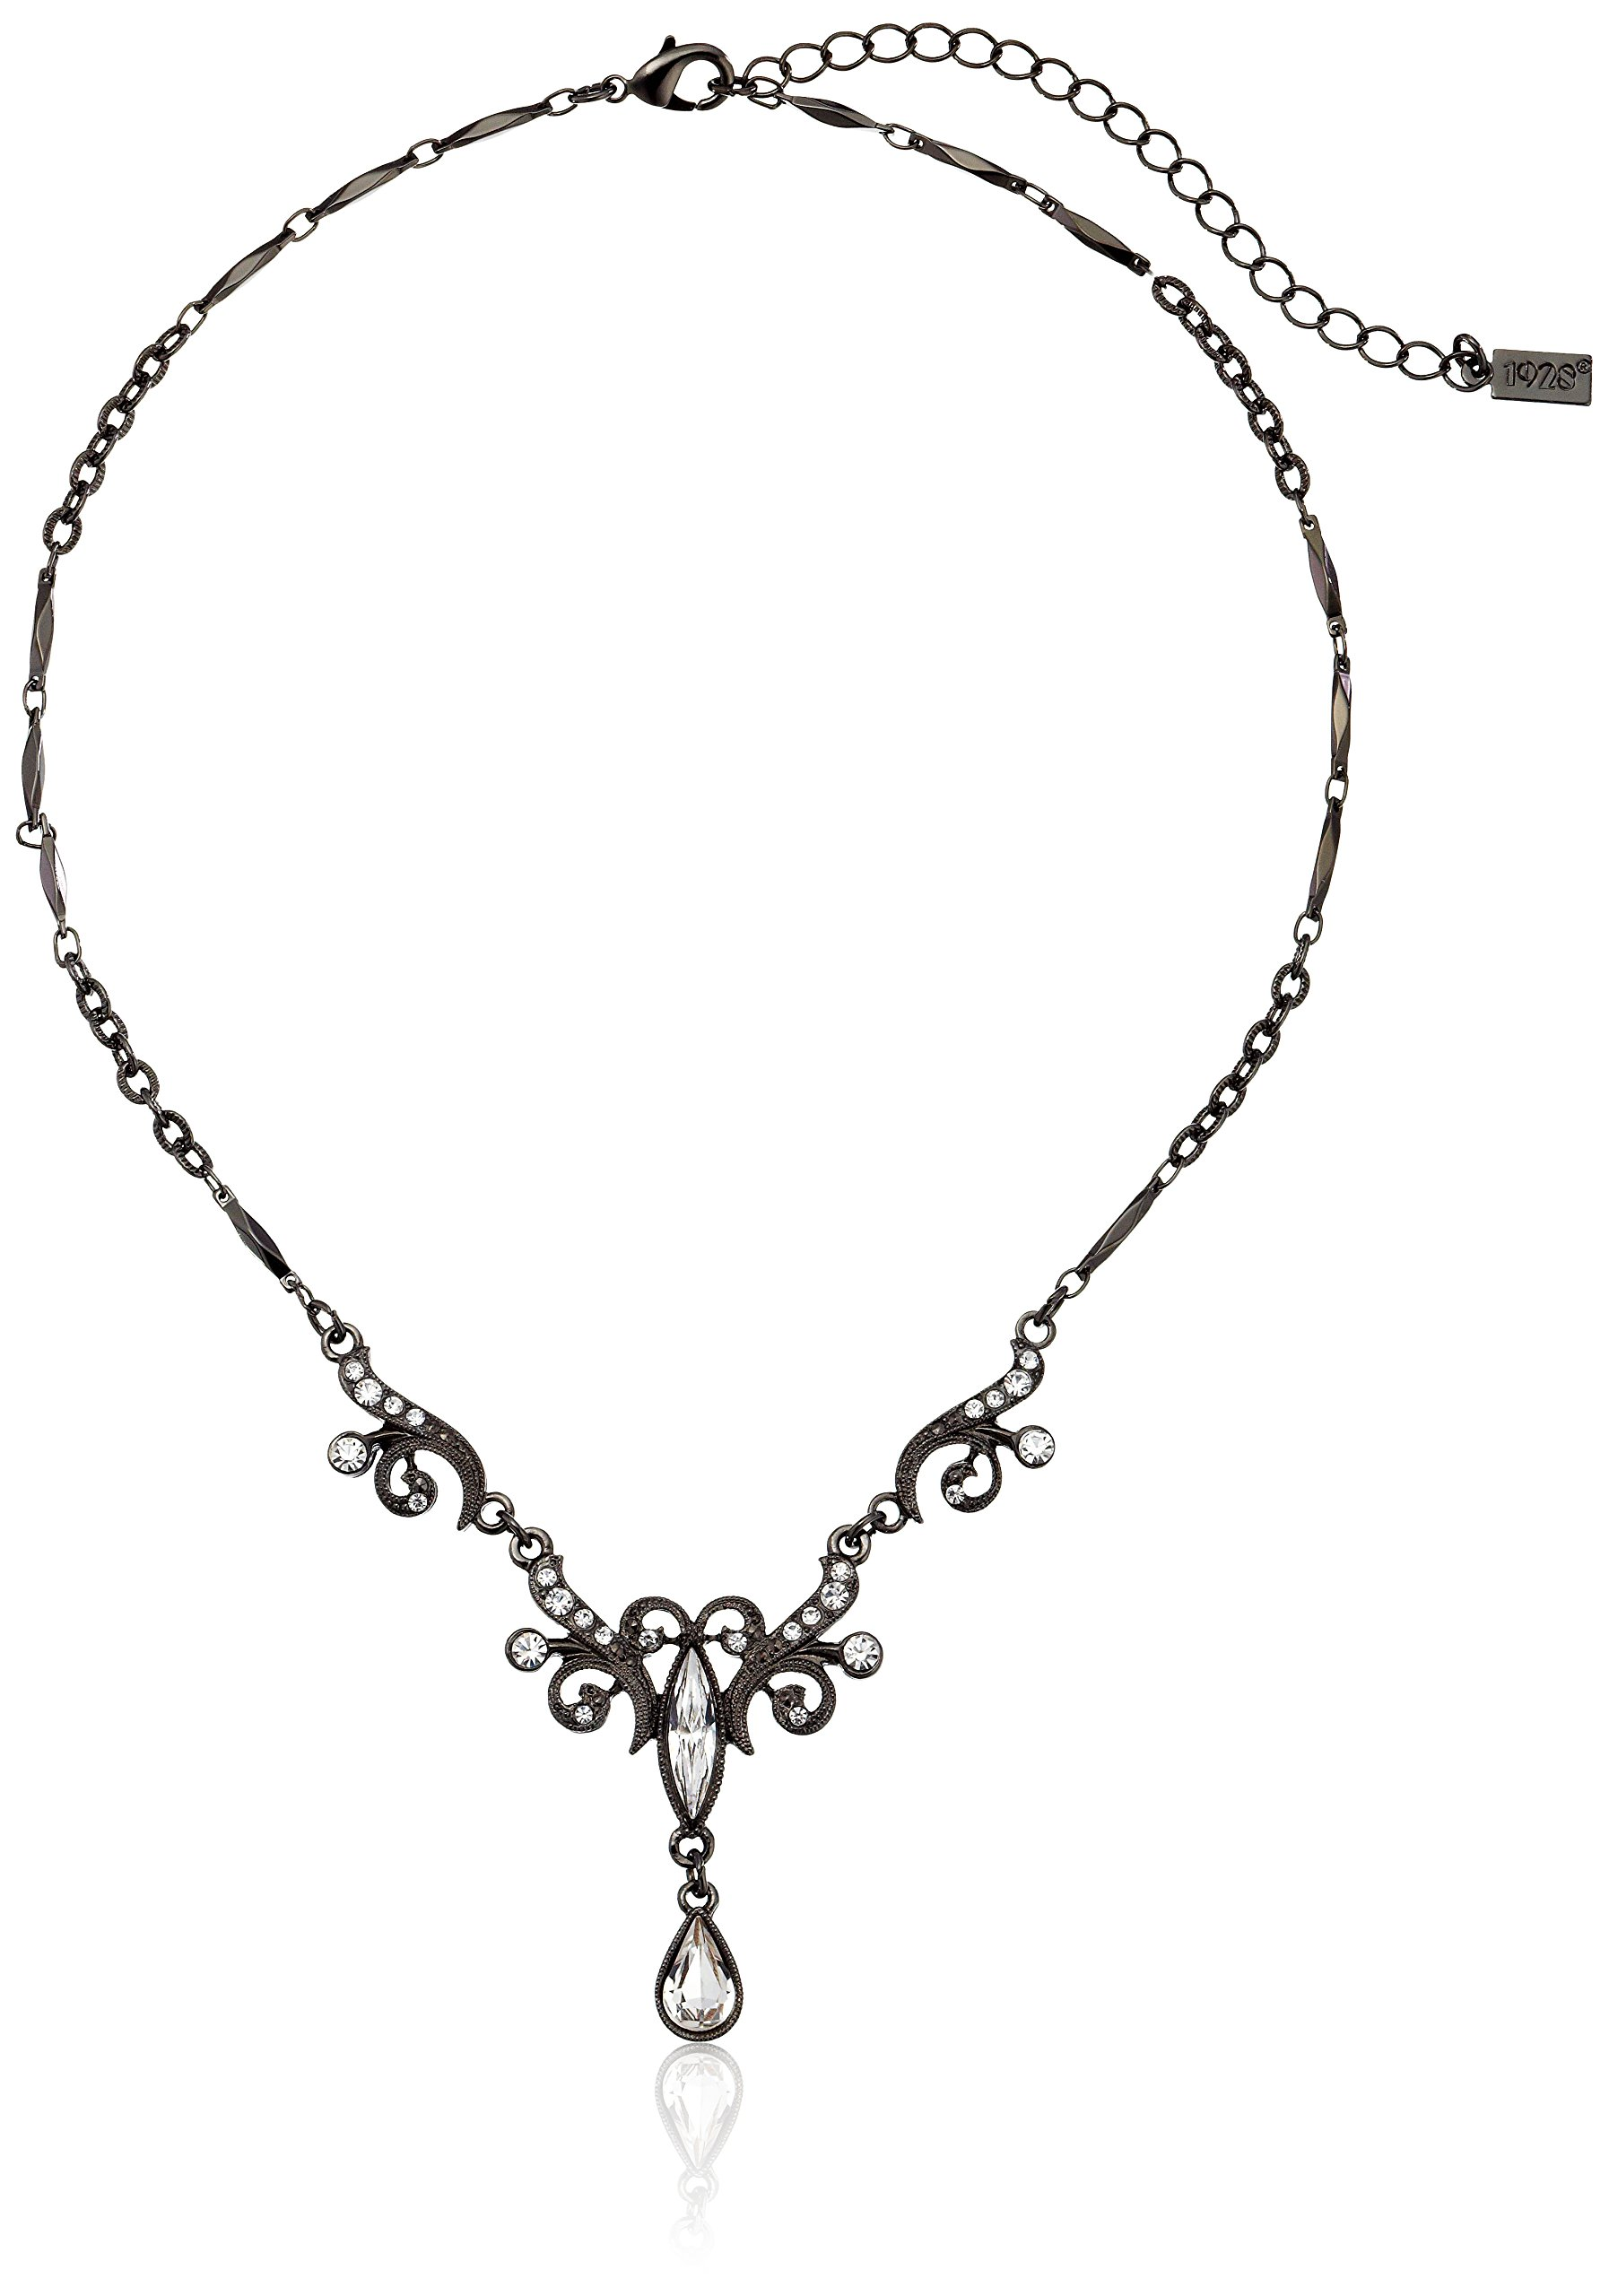 1928 Jewelry Black-Tone Crystal Teardrop Y-Shape Necklace, 15'' by 1928 Jewelry